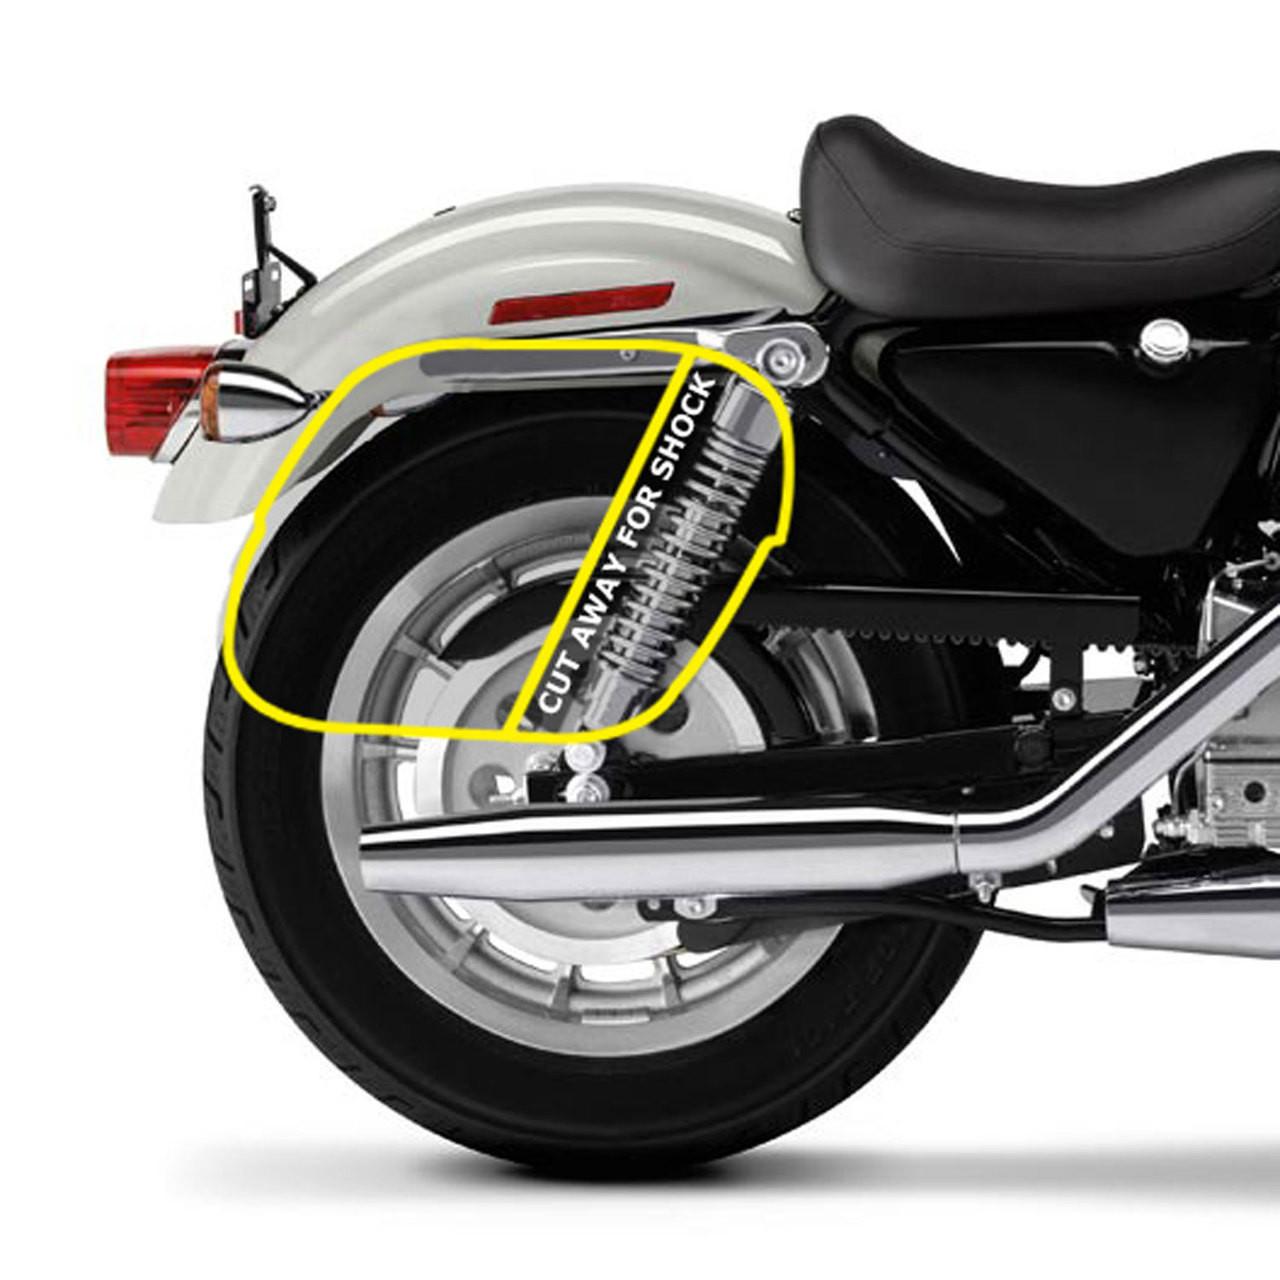 Viking Armor Shock Cutout Studded Motorcycle Saddlebags Bag Placement